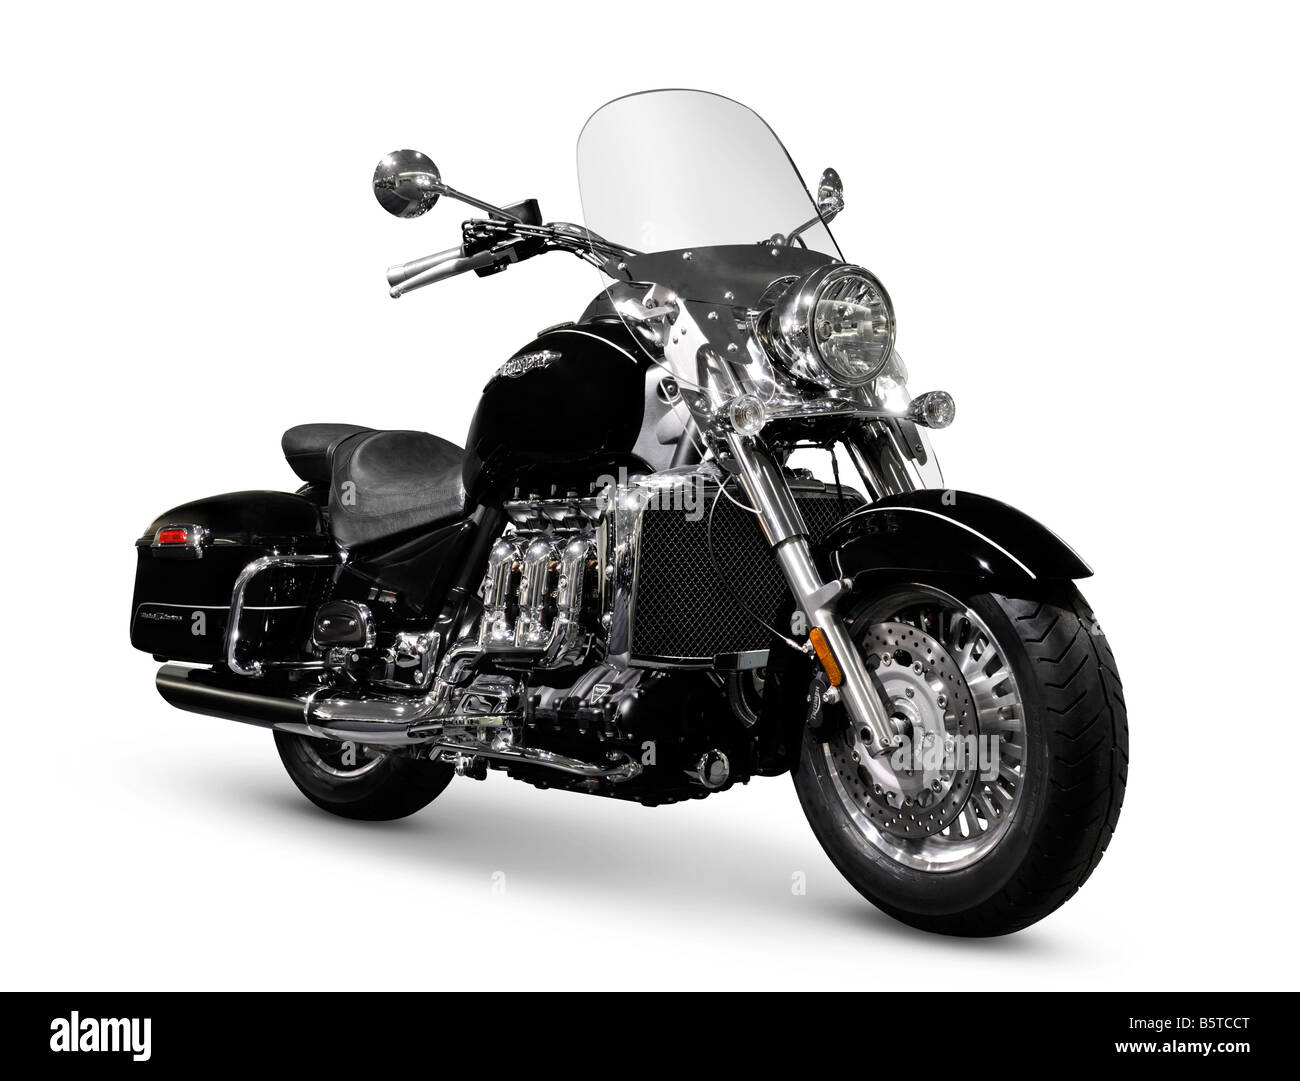 2008 Triumph Rocket III Touring motorbike - Stock Image